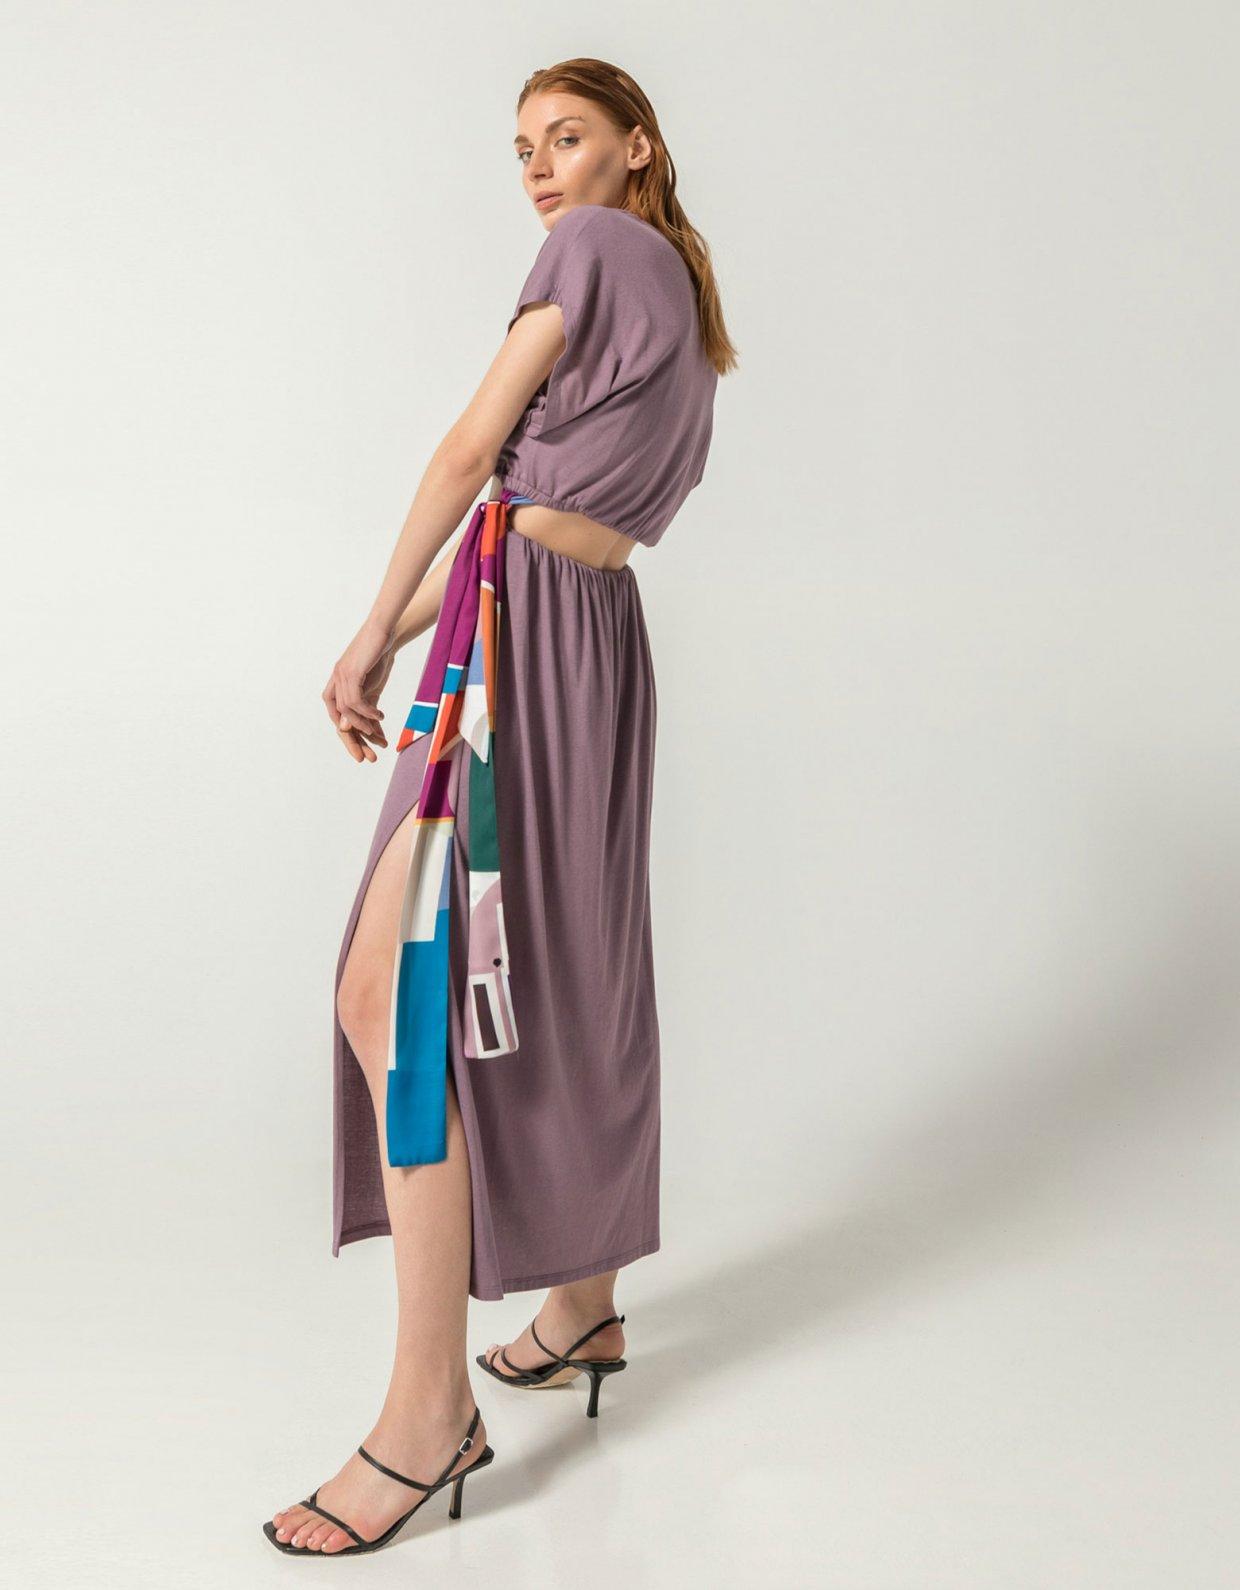 The Knl's Atene co-ords 2 in 1 dress lavender